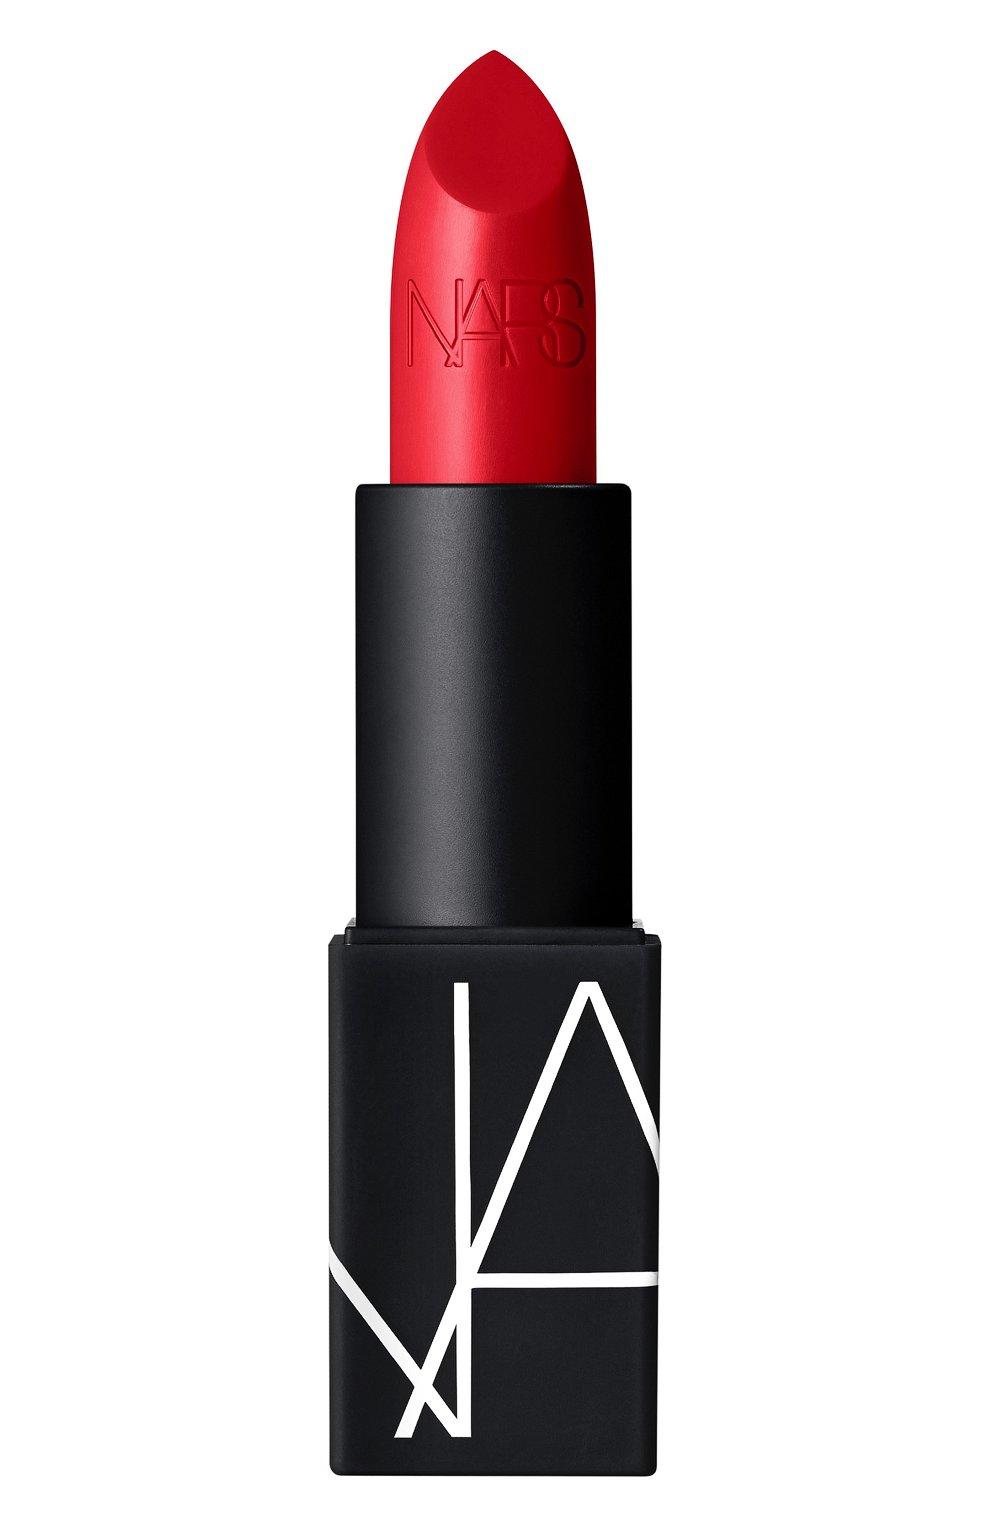 Женская помада для губ, оттенок inappropriate red NARS бесцветного цвета, арт. 2977NS | Фото 1